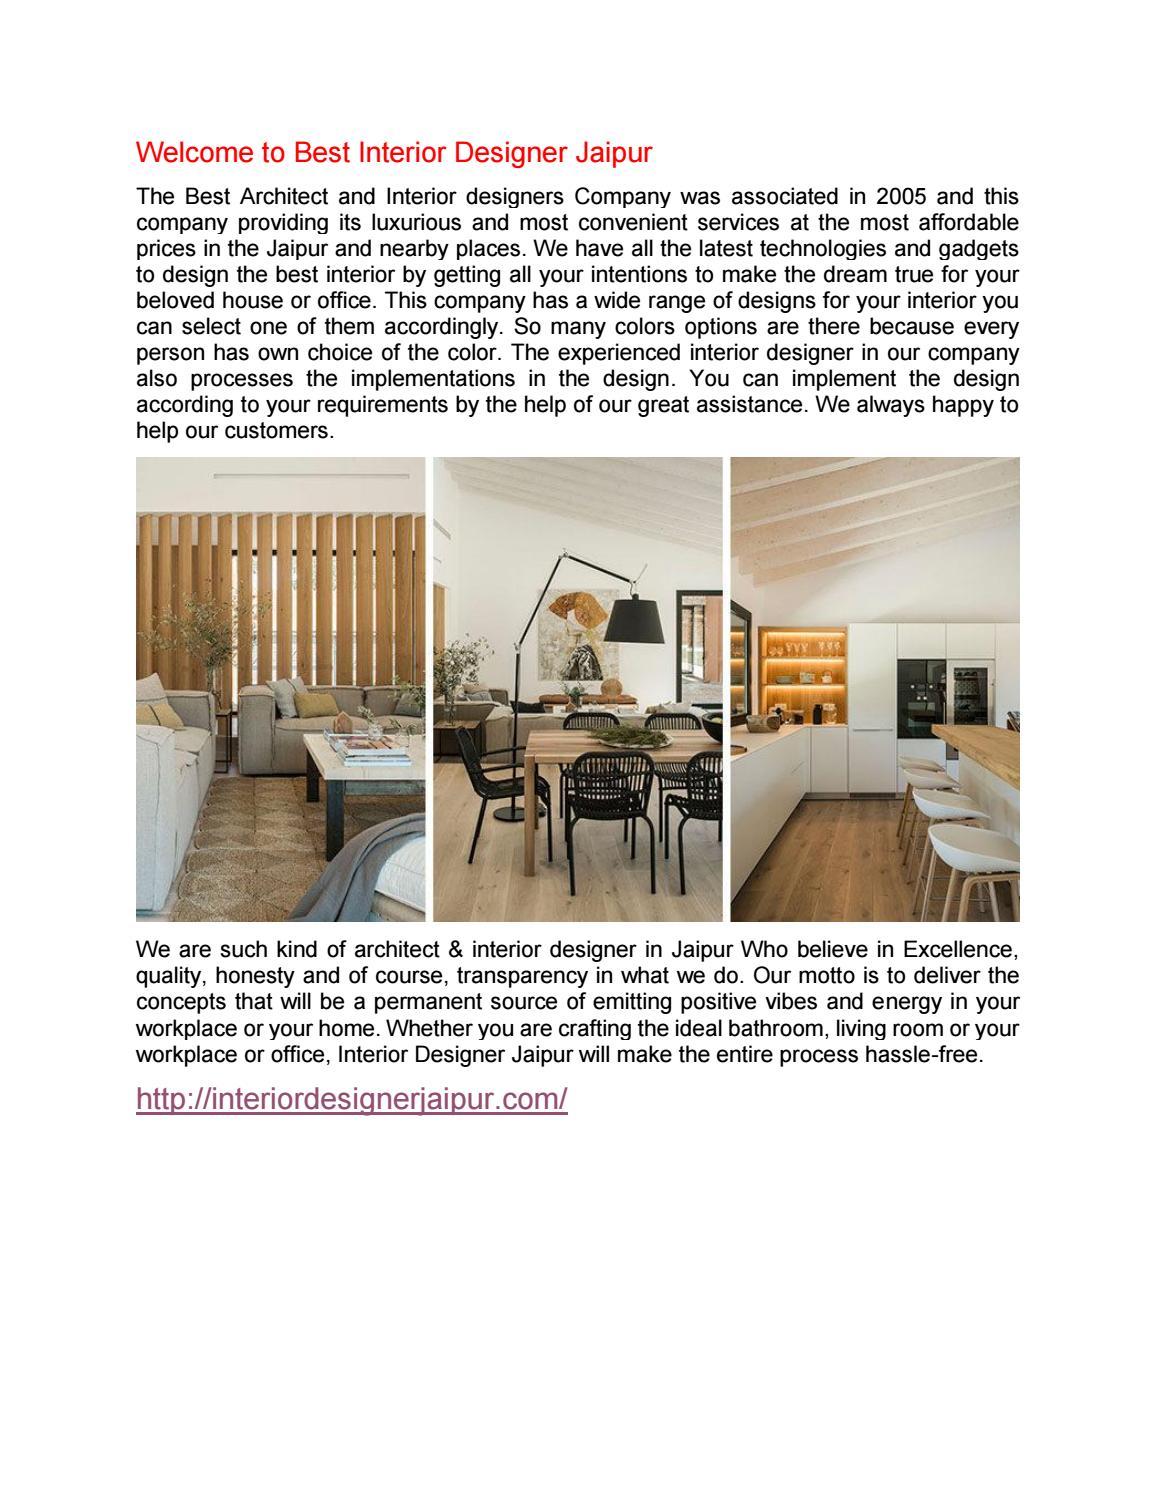 Best Interior Designer In Jaipur Ll Call On 9828723800 By Interiordesignerjaipur Issuu